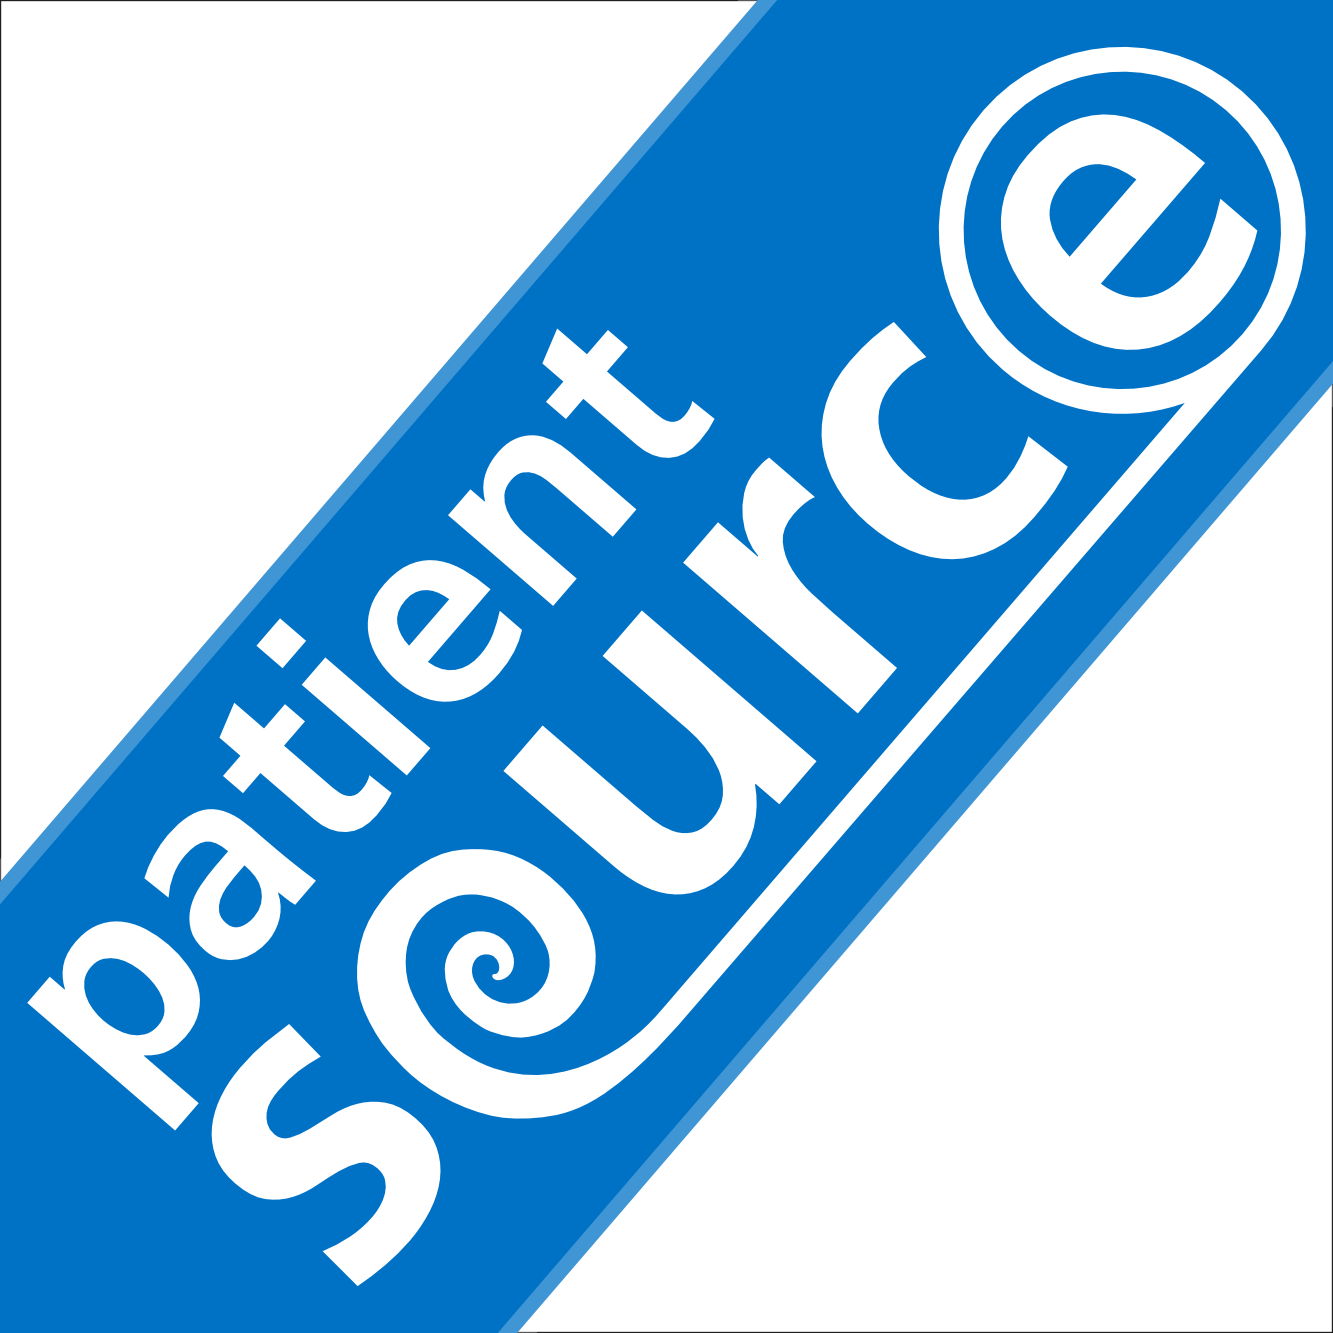 PatientSource - Square diagonal logo inverted